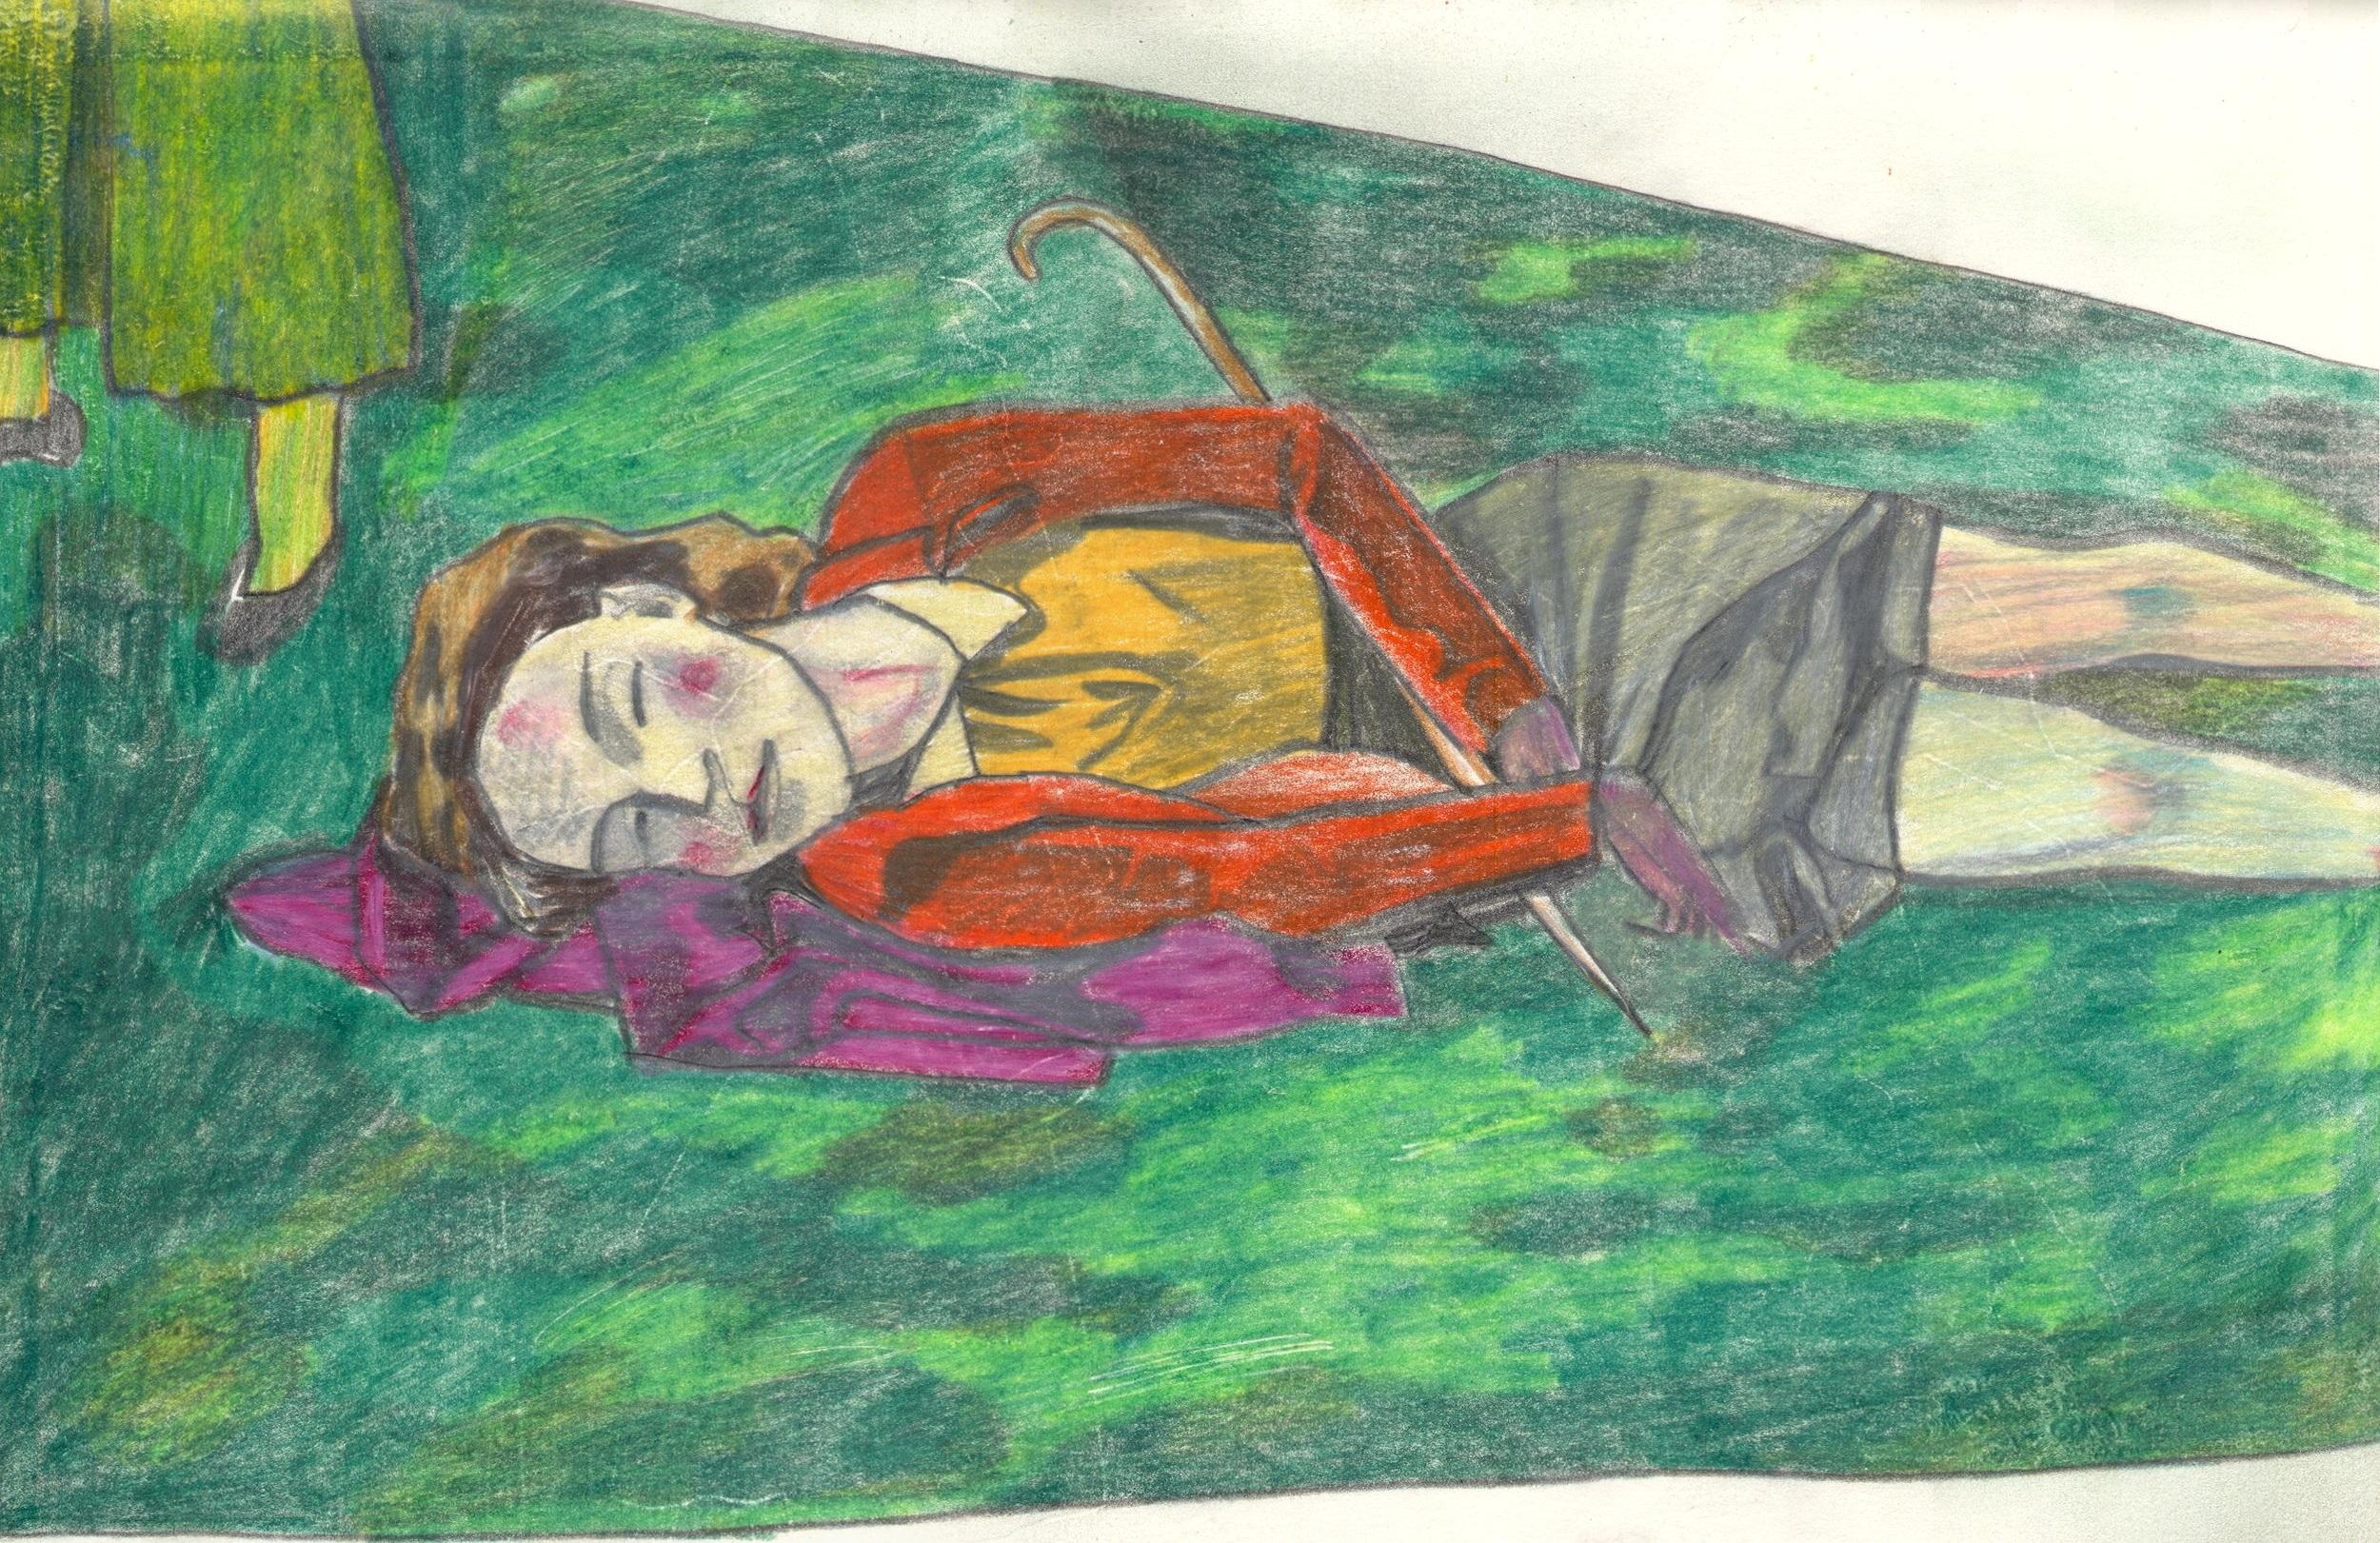 O.T. ( Serie Balthus 11 ), 2019  Bleistift auf Papier, 26x35.5cm